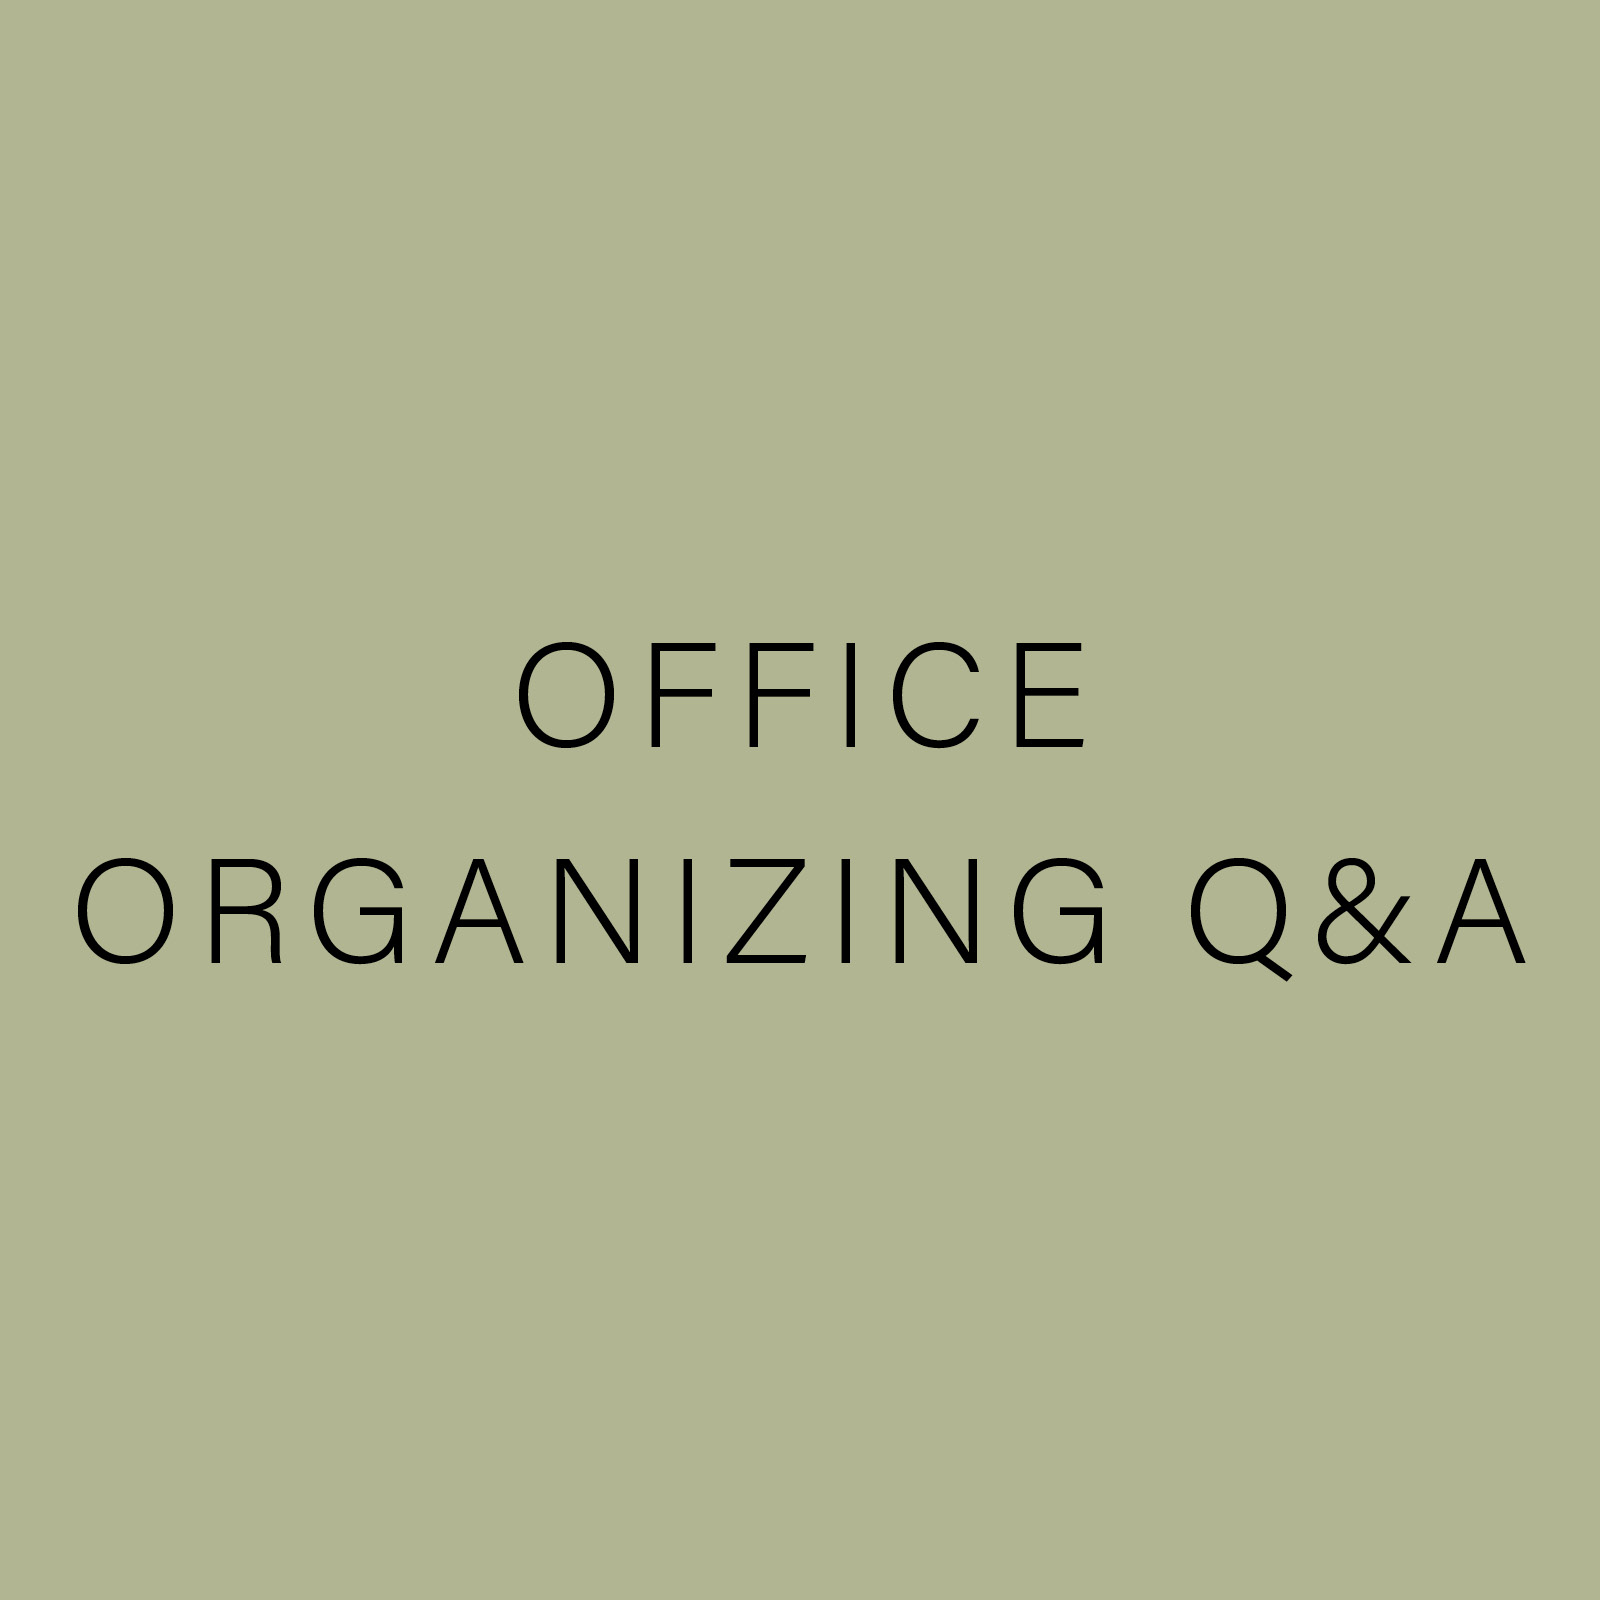 Office Organizing QA.jpg